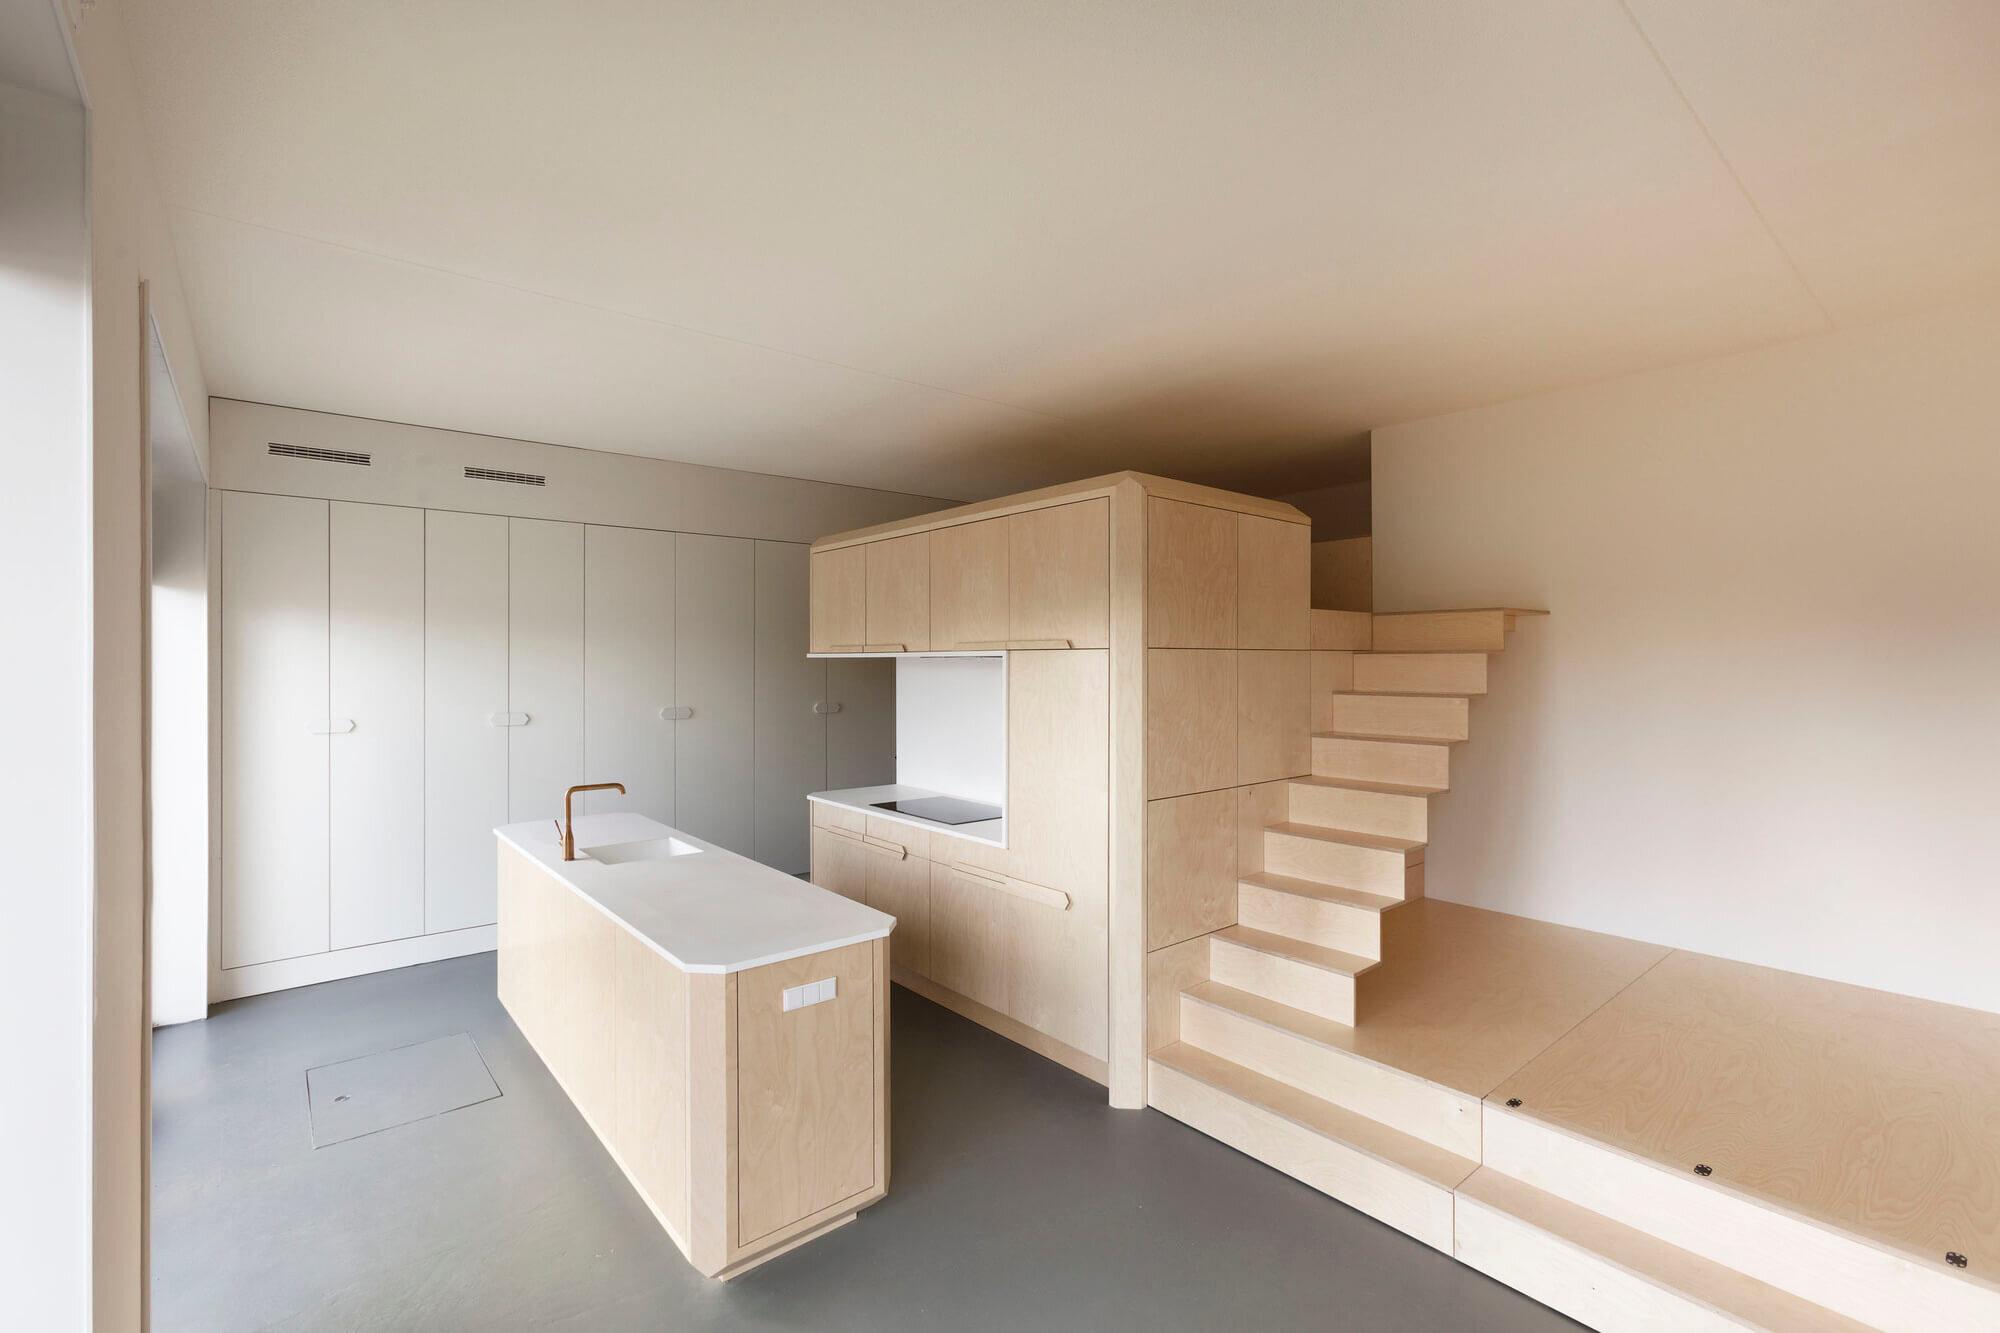 Loft-Buiksloterham-Heren-5-Architects-The-Netherlands-2